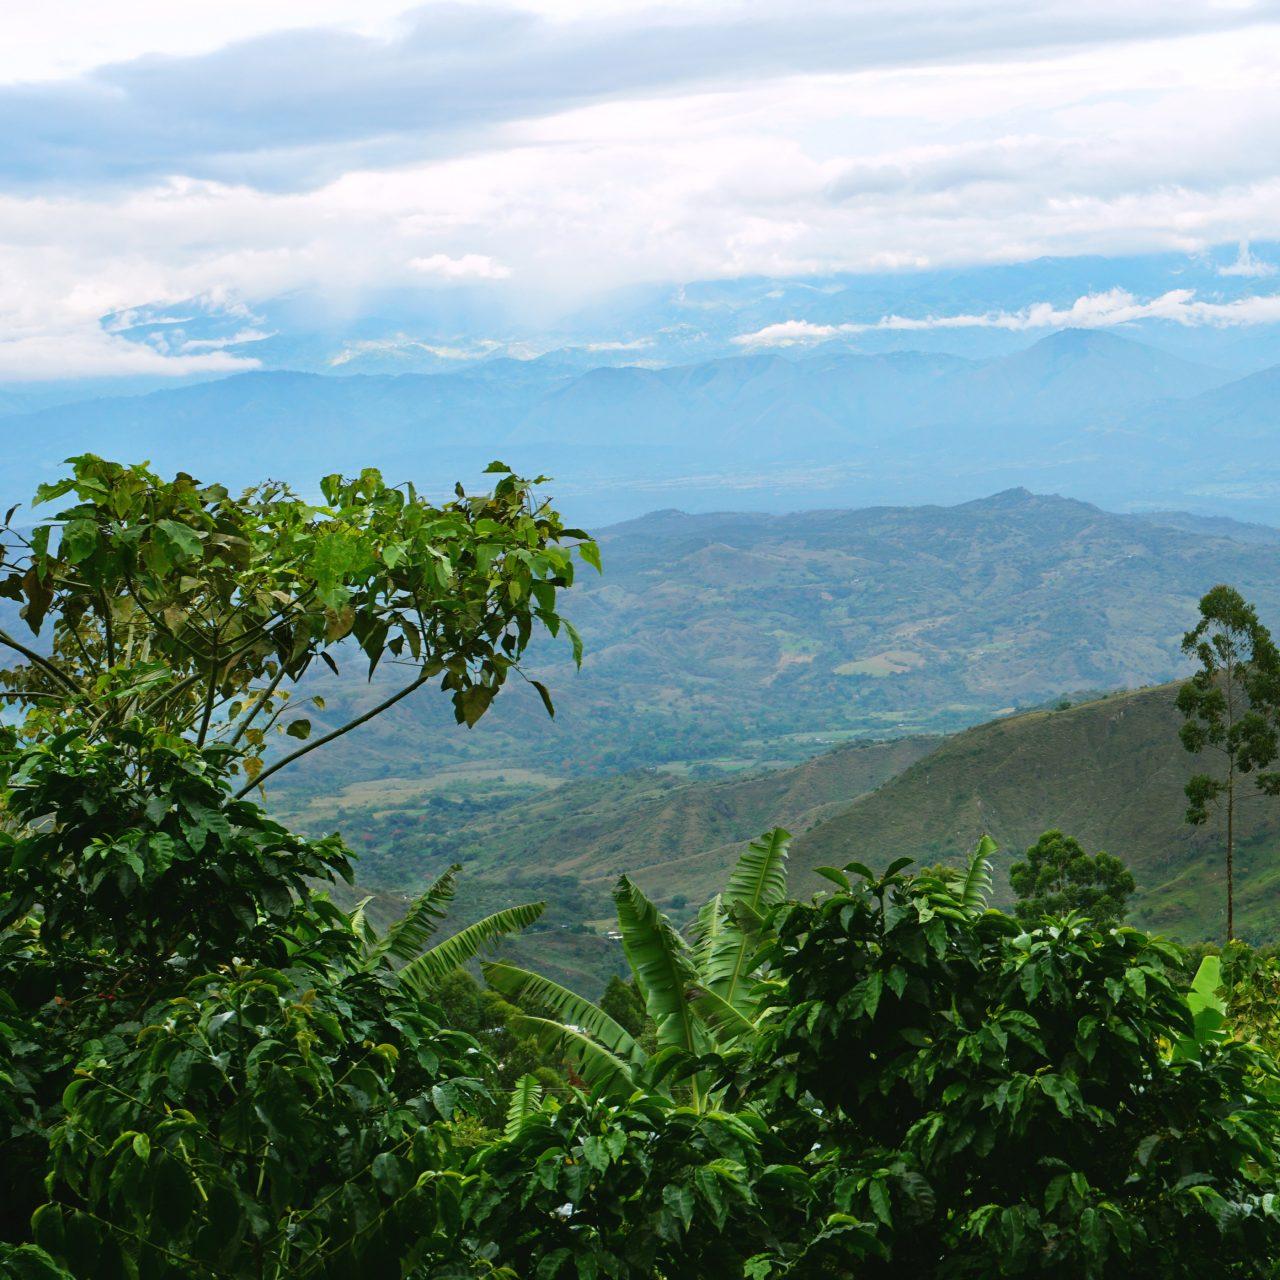 View of the Central Cordillera mountains from the Guarnizo farm